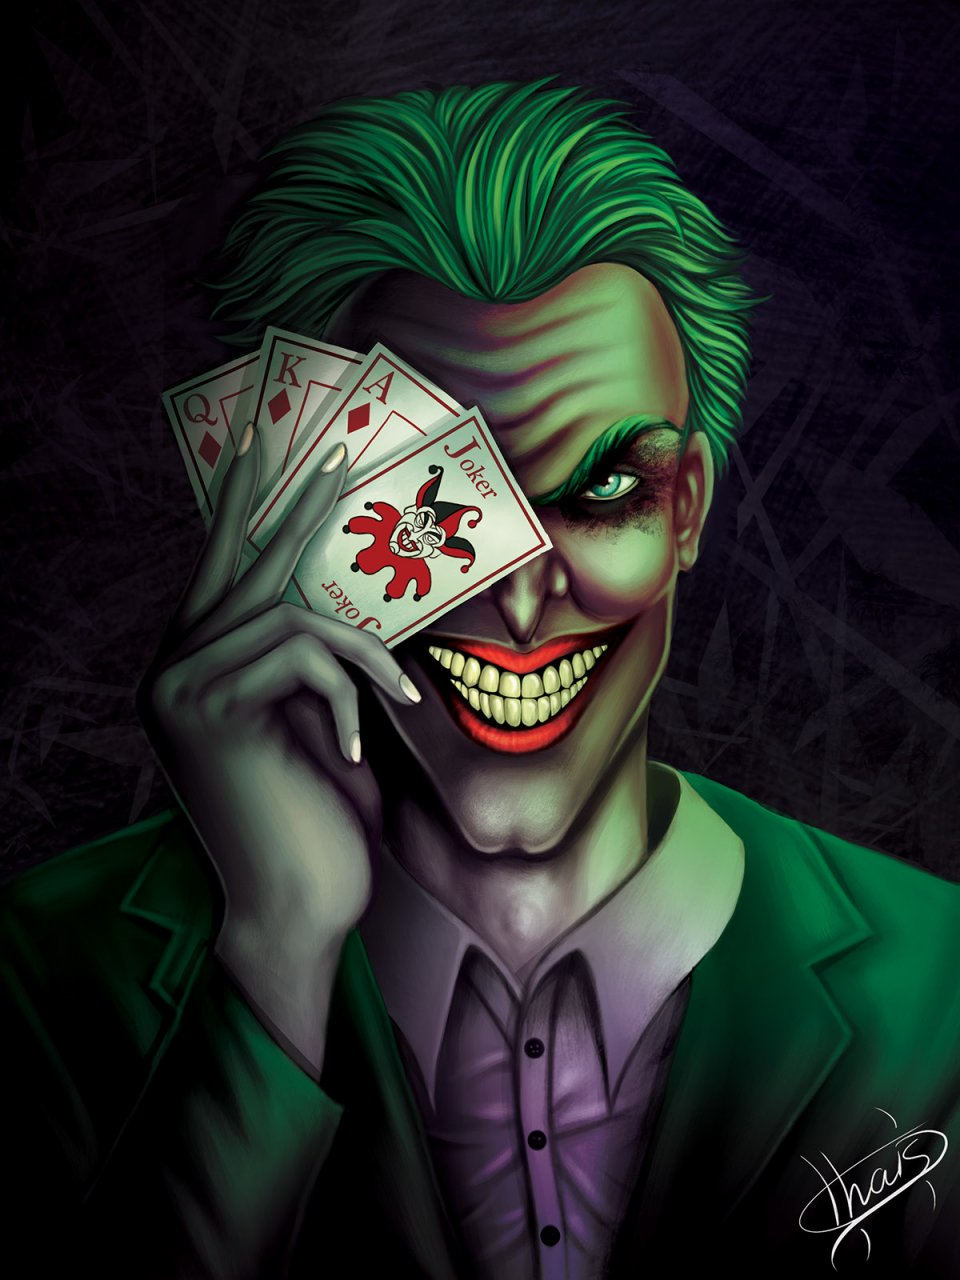 Joker and harley quinn graphic transparent download Colorful Joker And Harley Quinn Art - Sci-Fi Design graphic transparent download